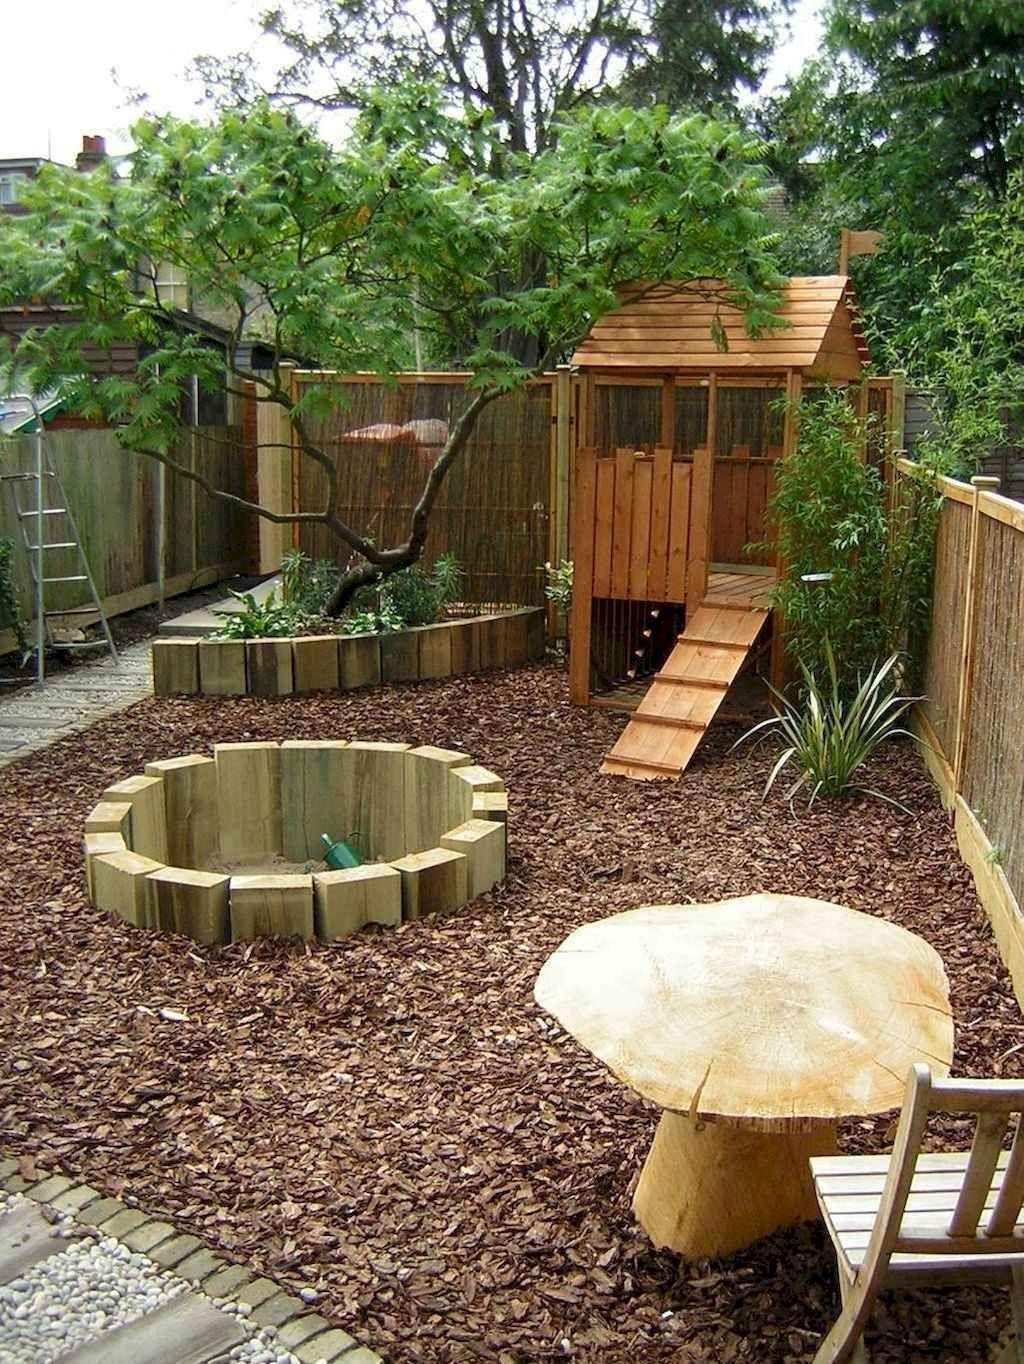 64 Fantastic Backyard Kids Garden Ideas for Outdoor Summer ...